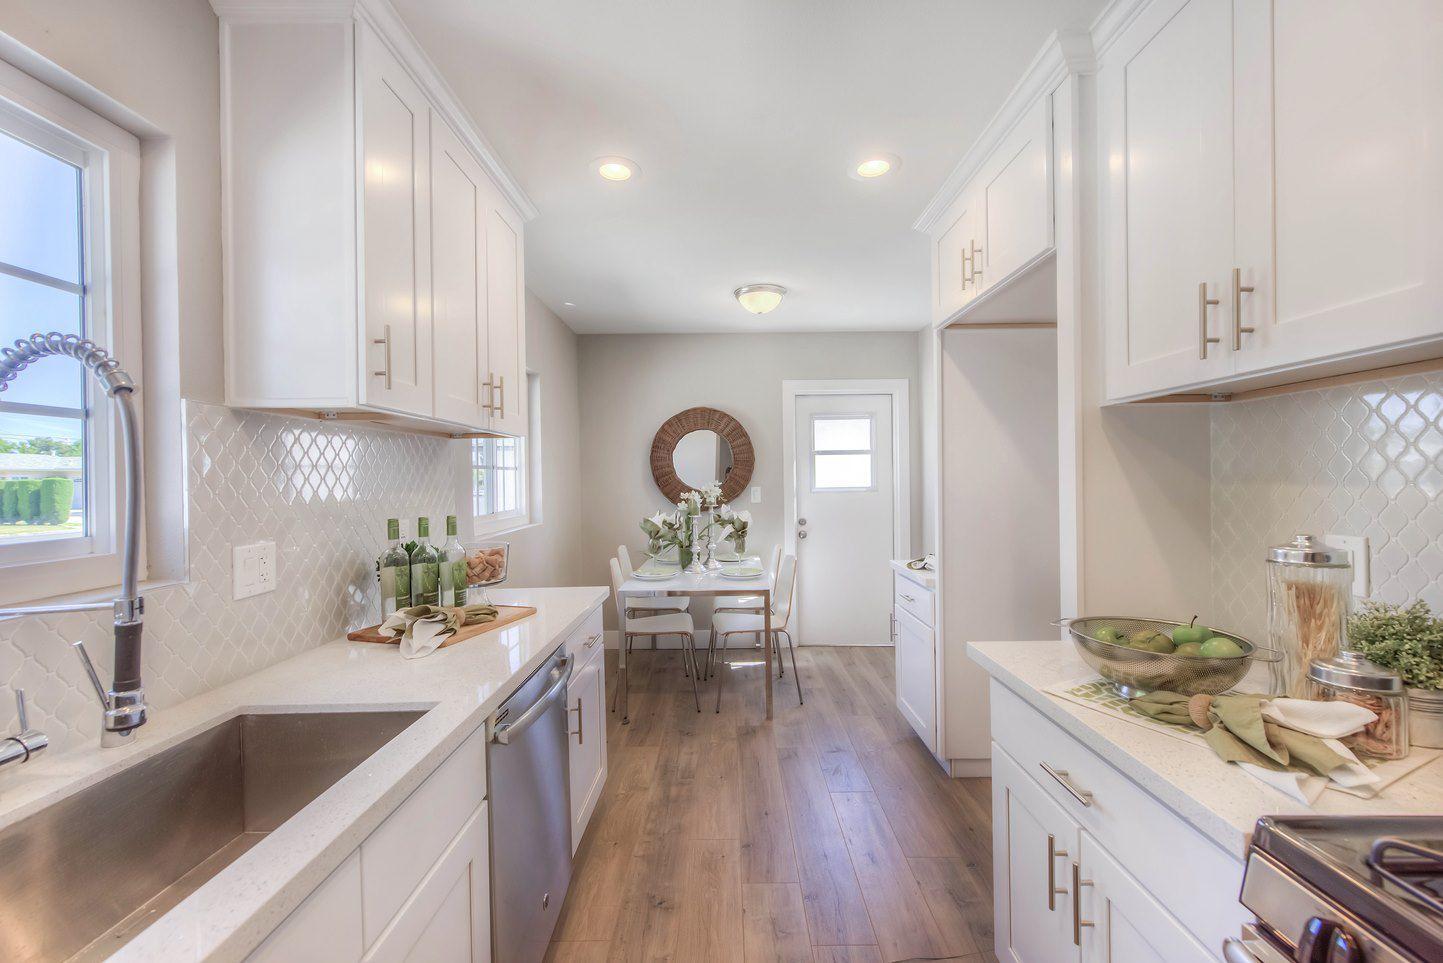 Kitchen Remodeling Contractors - T&C Construction & Design | Home ...